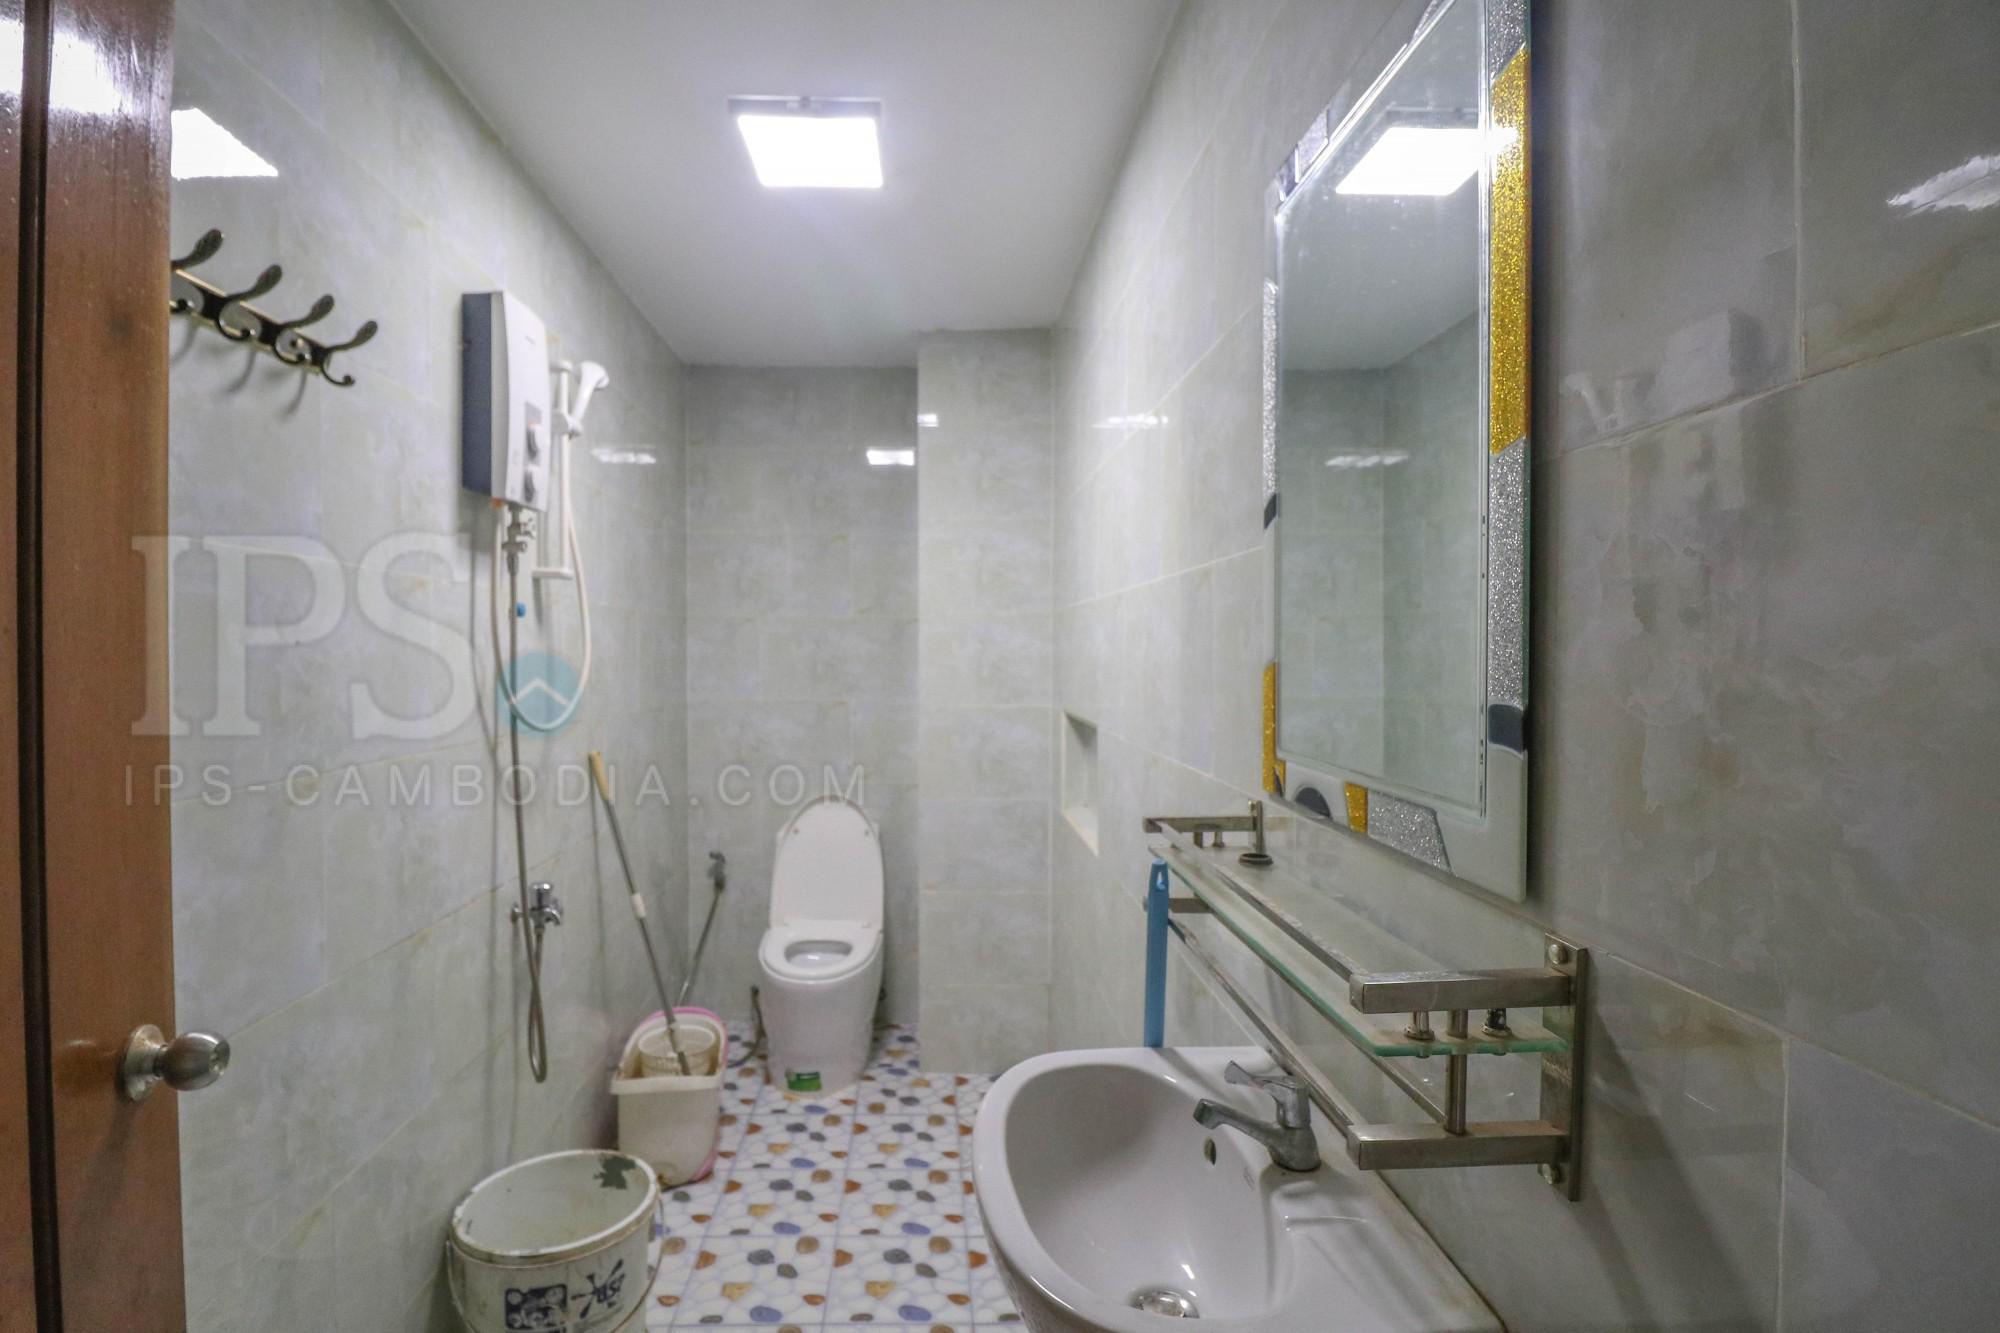 8 Bedroom House For Rent - Mittapheap, Sihanoukville